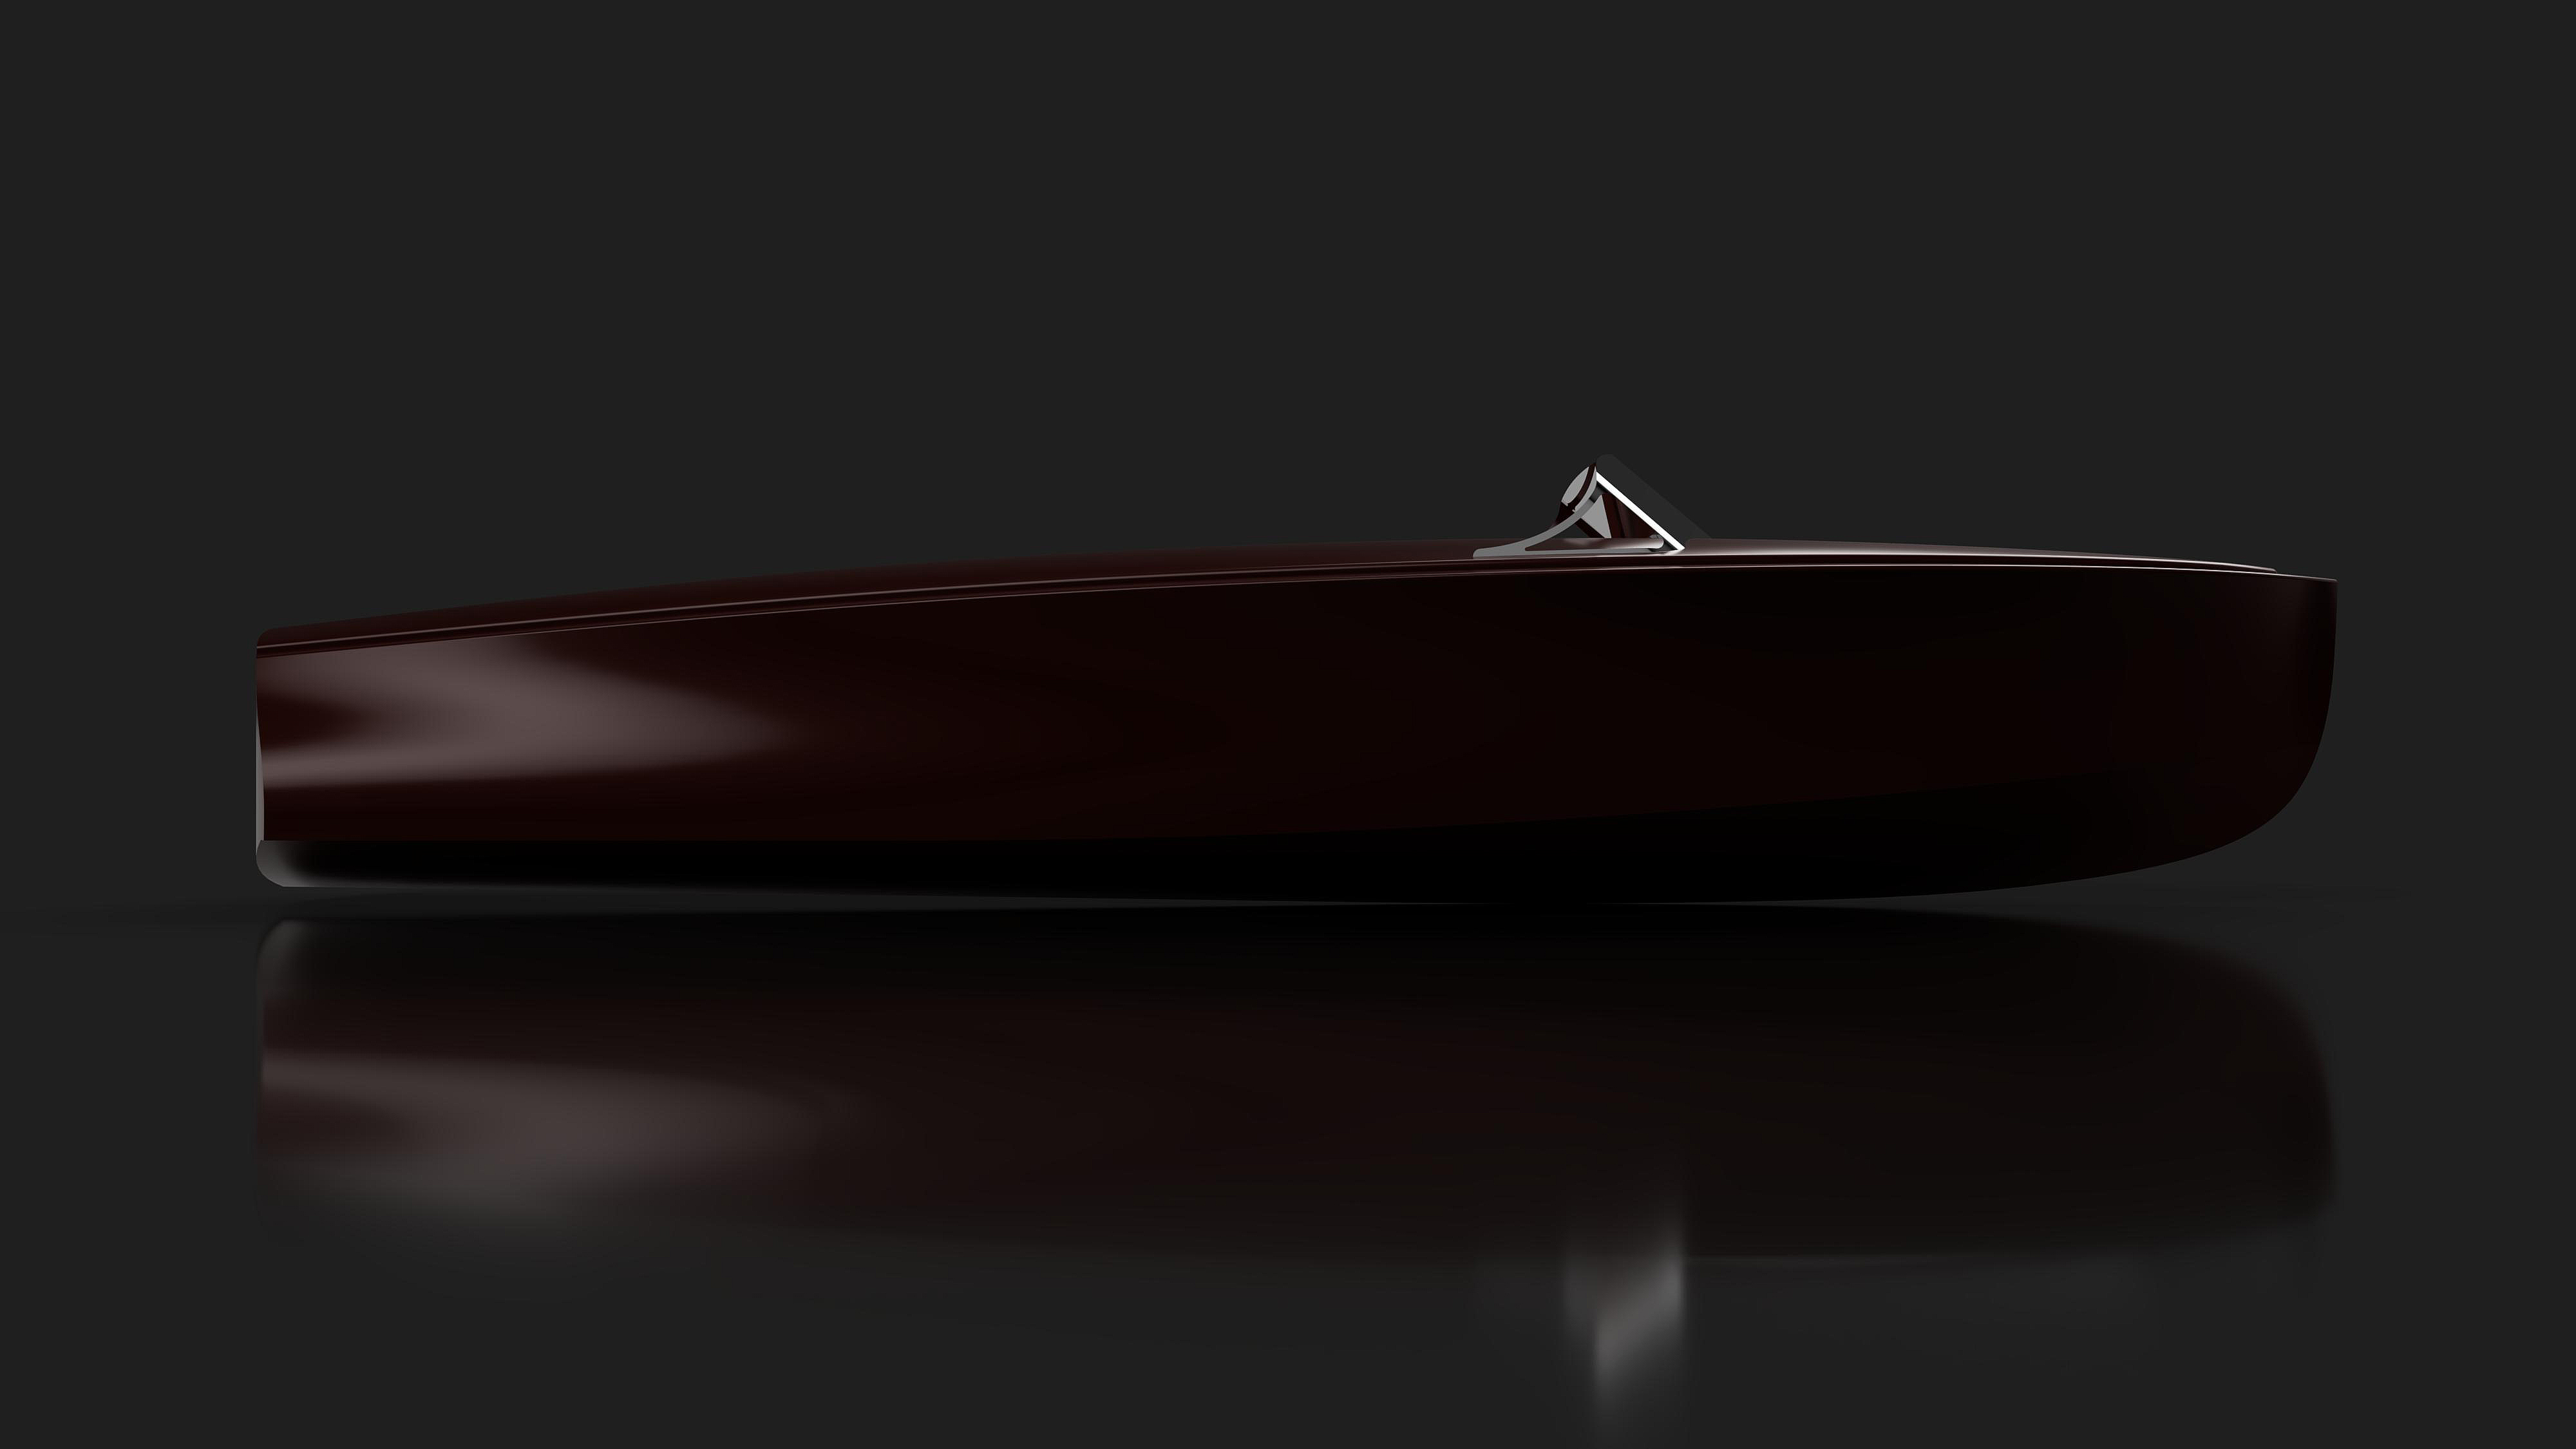 Wooden yacht tender modern classic wooden runabout